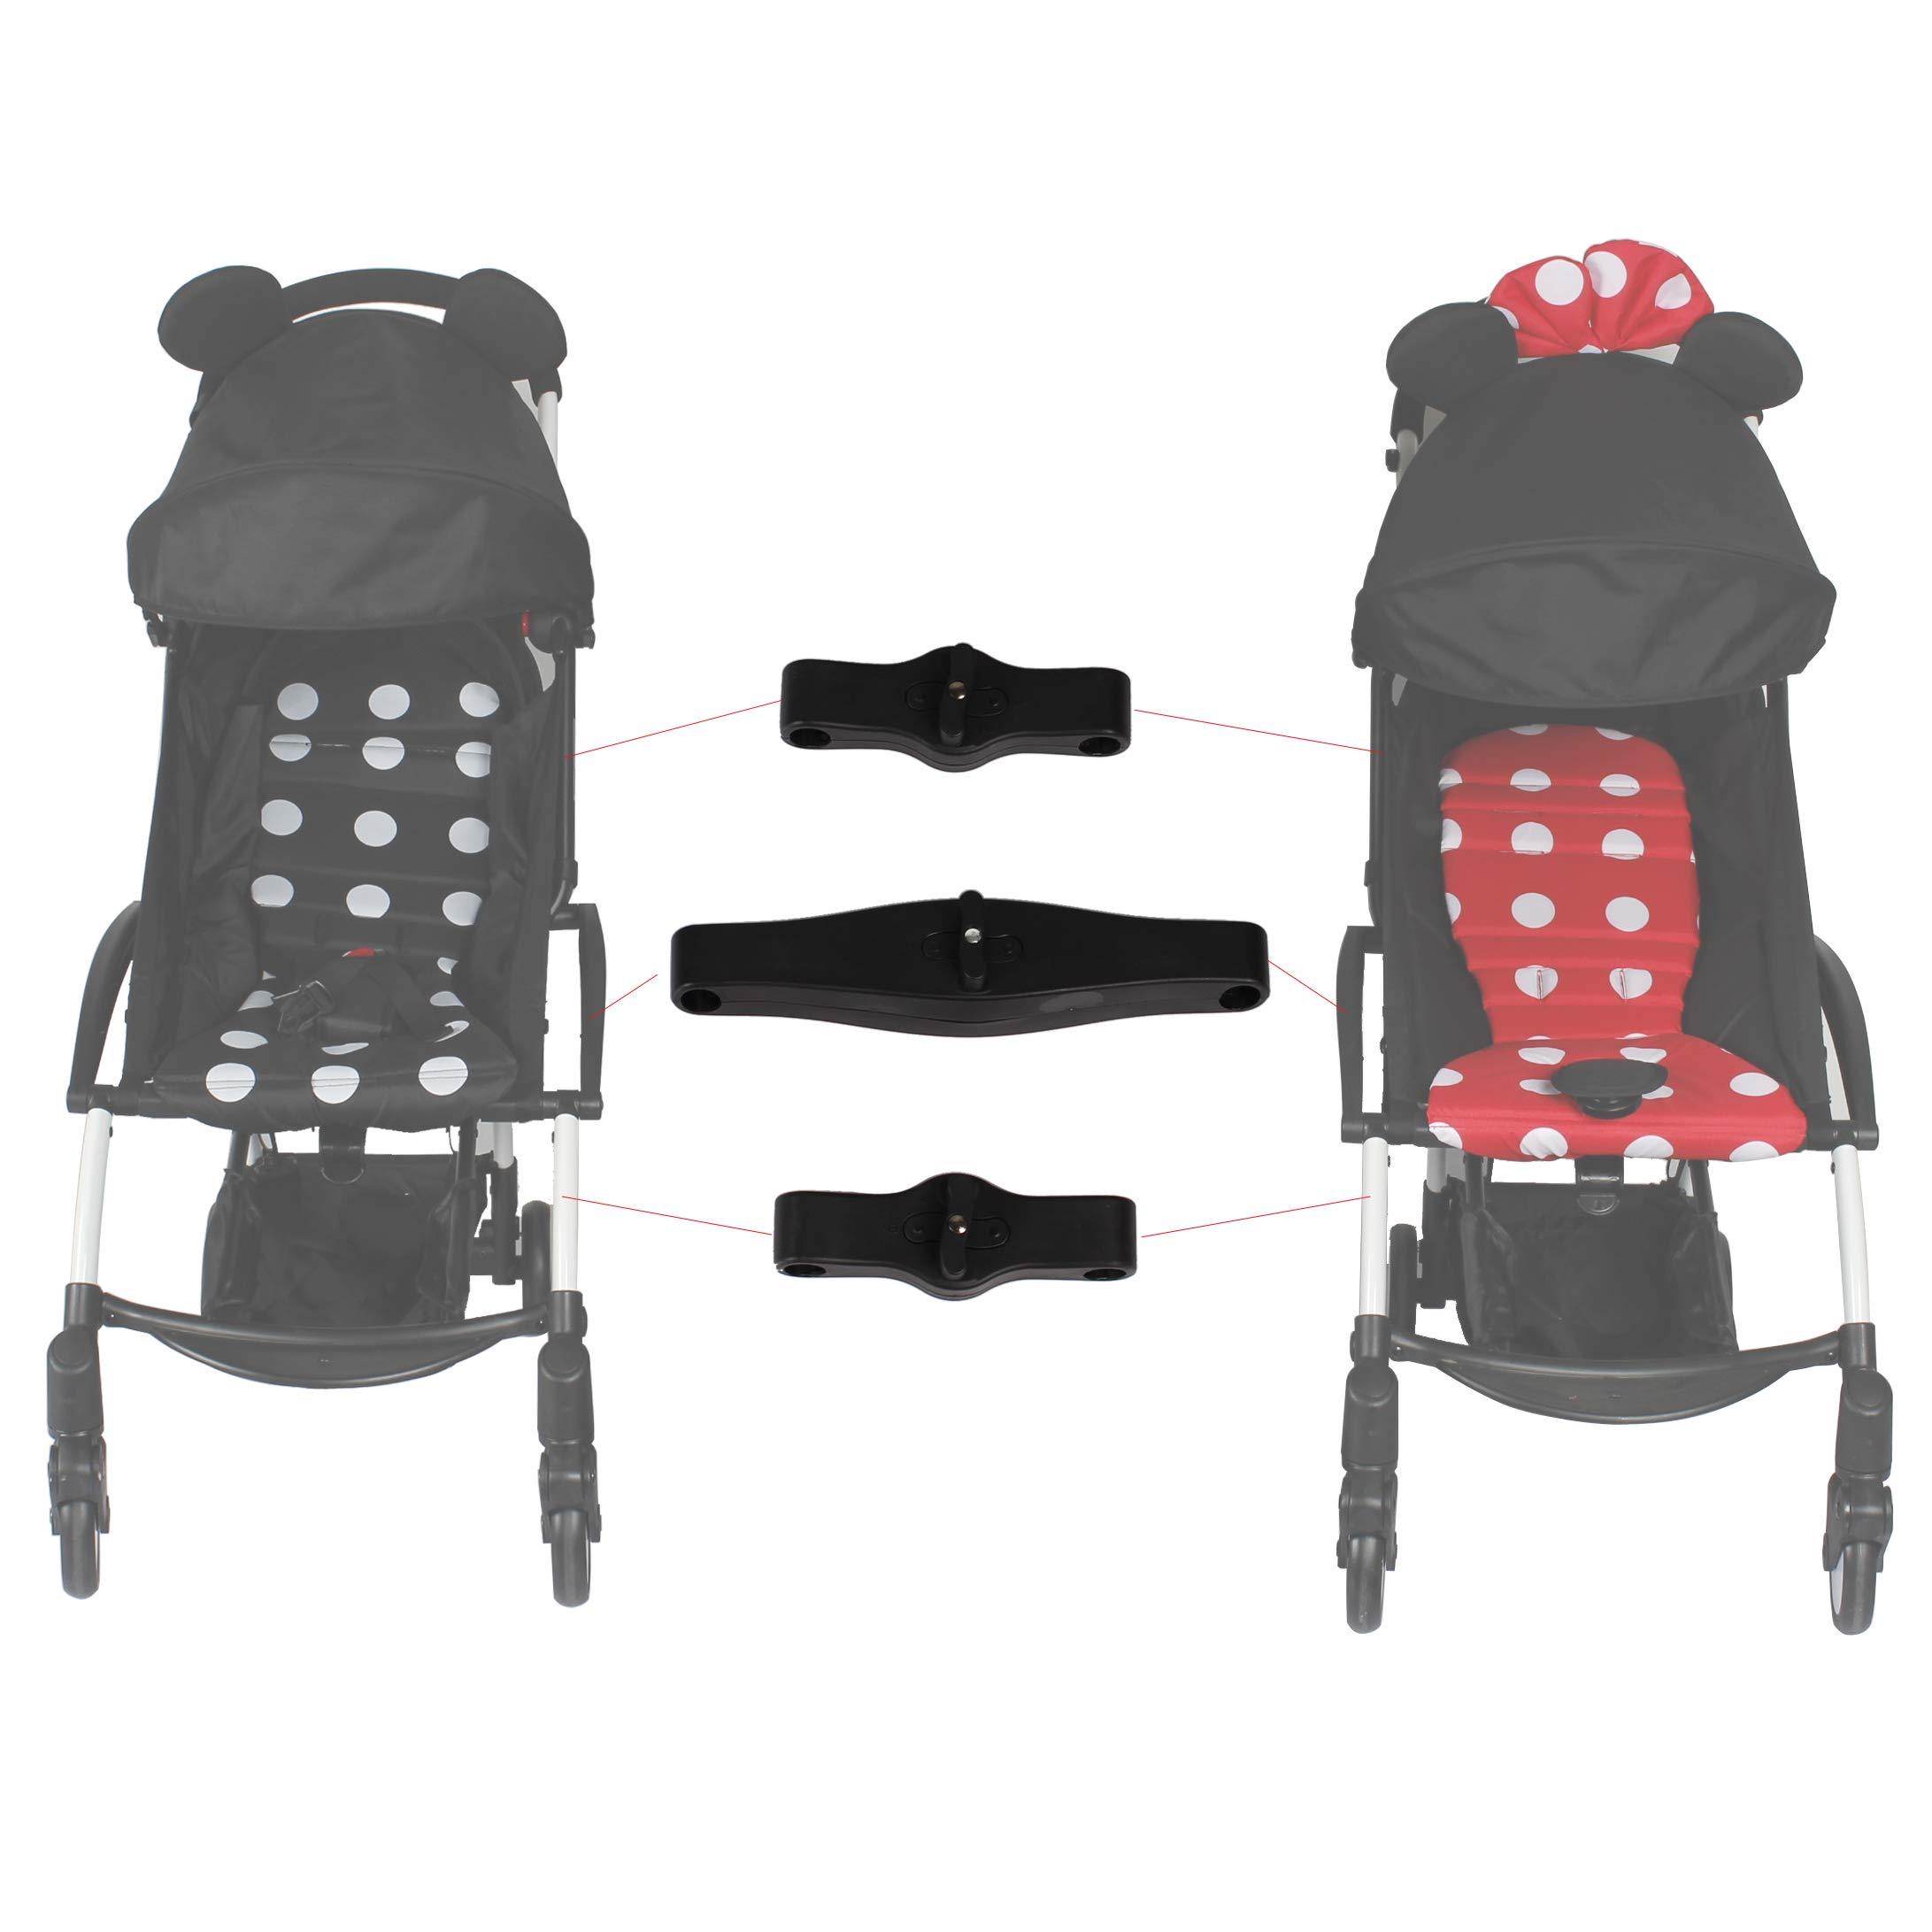 Stroller Connectors for Babyzen YOYO YOYO+ Strollers,Turns Two Single Strollers into a Double Stroller by ROMIRUS